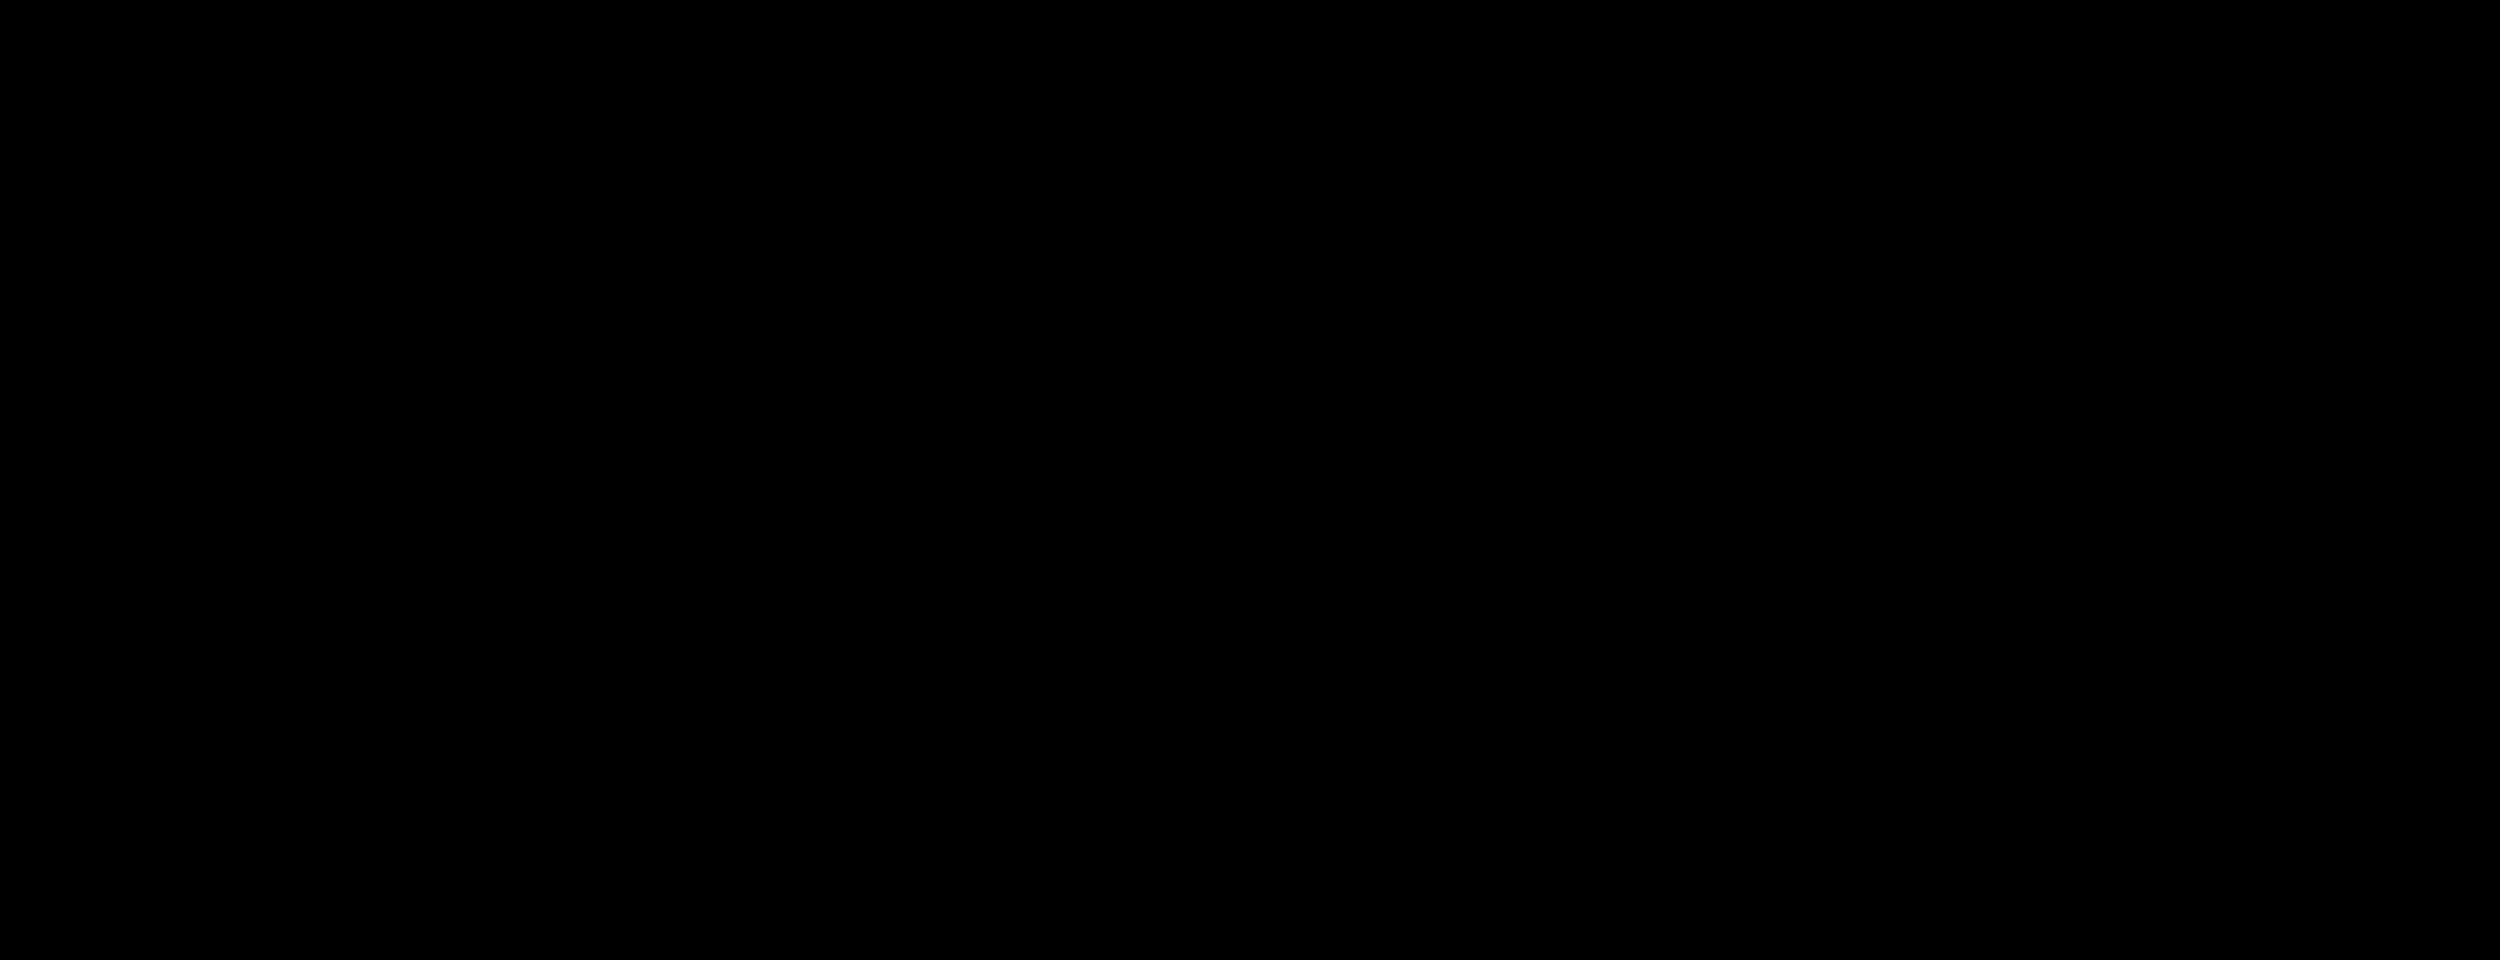 01_logo_lockup.png